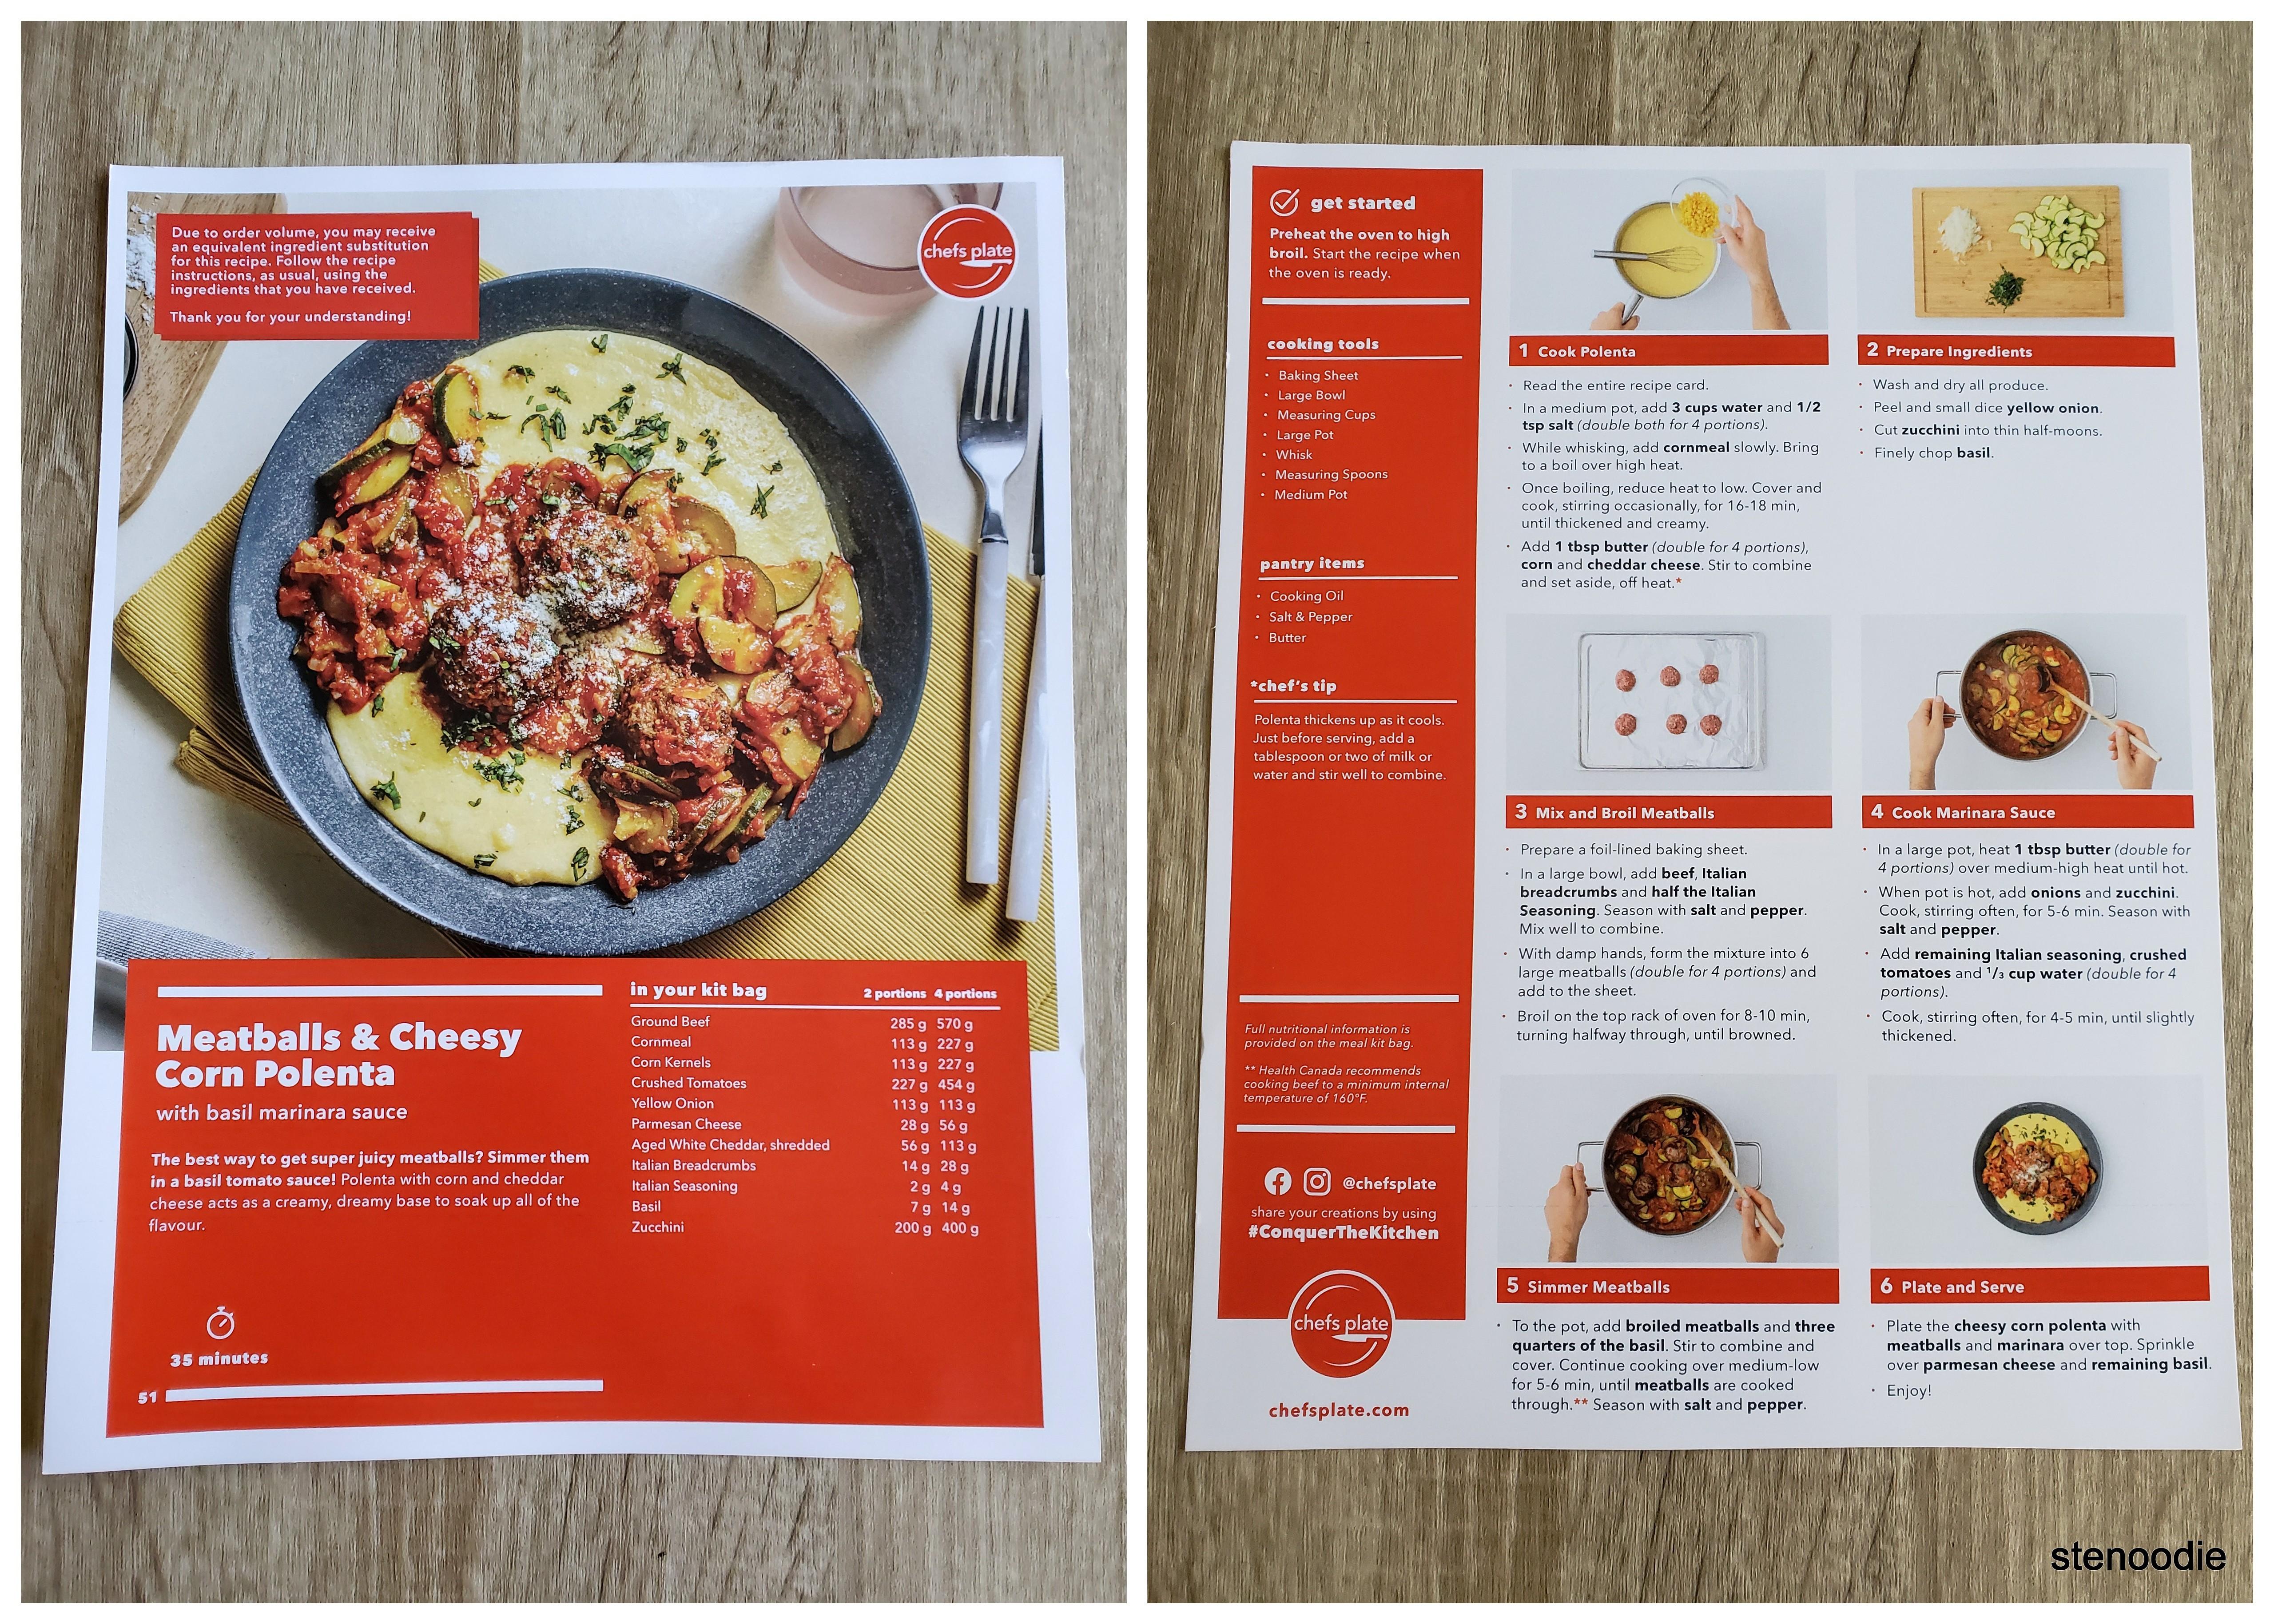 Meatballs & Cheesy Corn Polenta recipe card